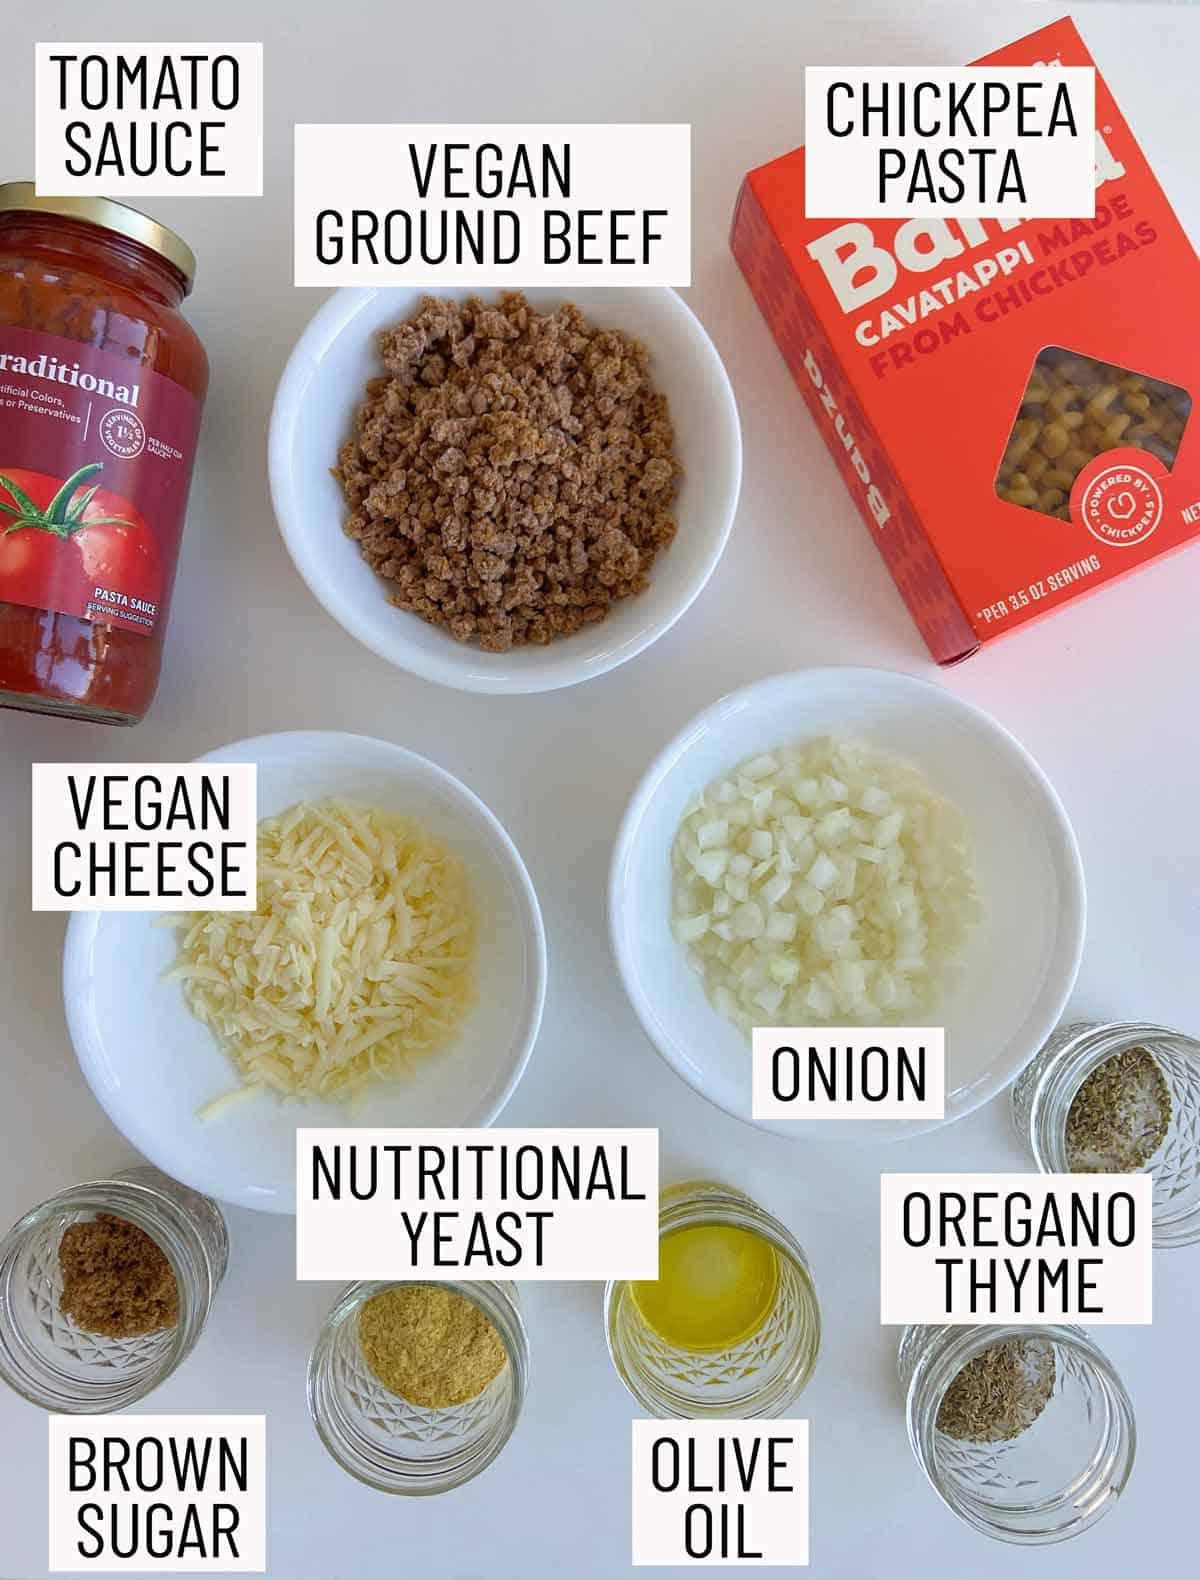 Overhead view of ingredients needed to make vegan beefaroni.